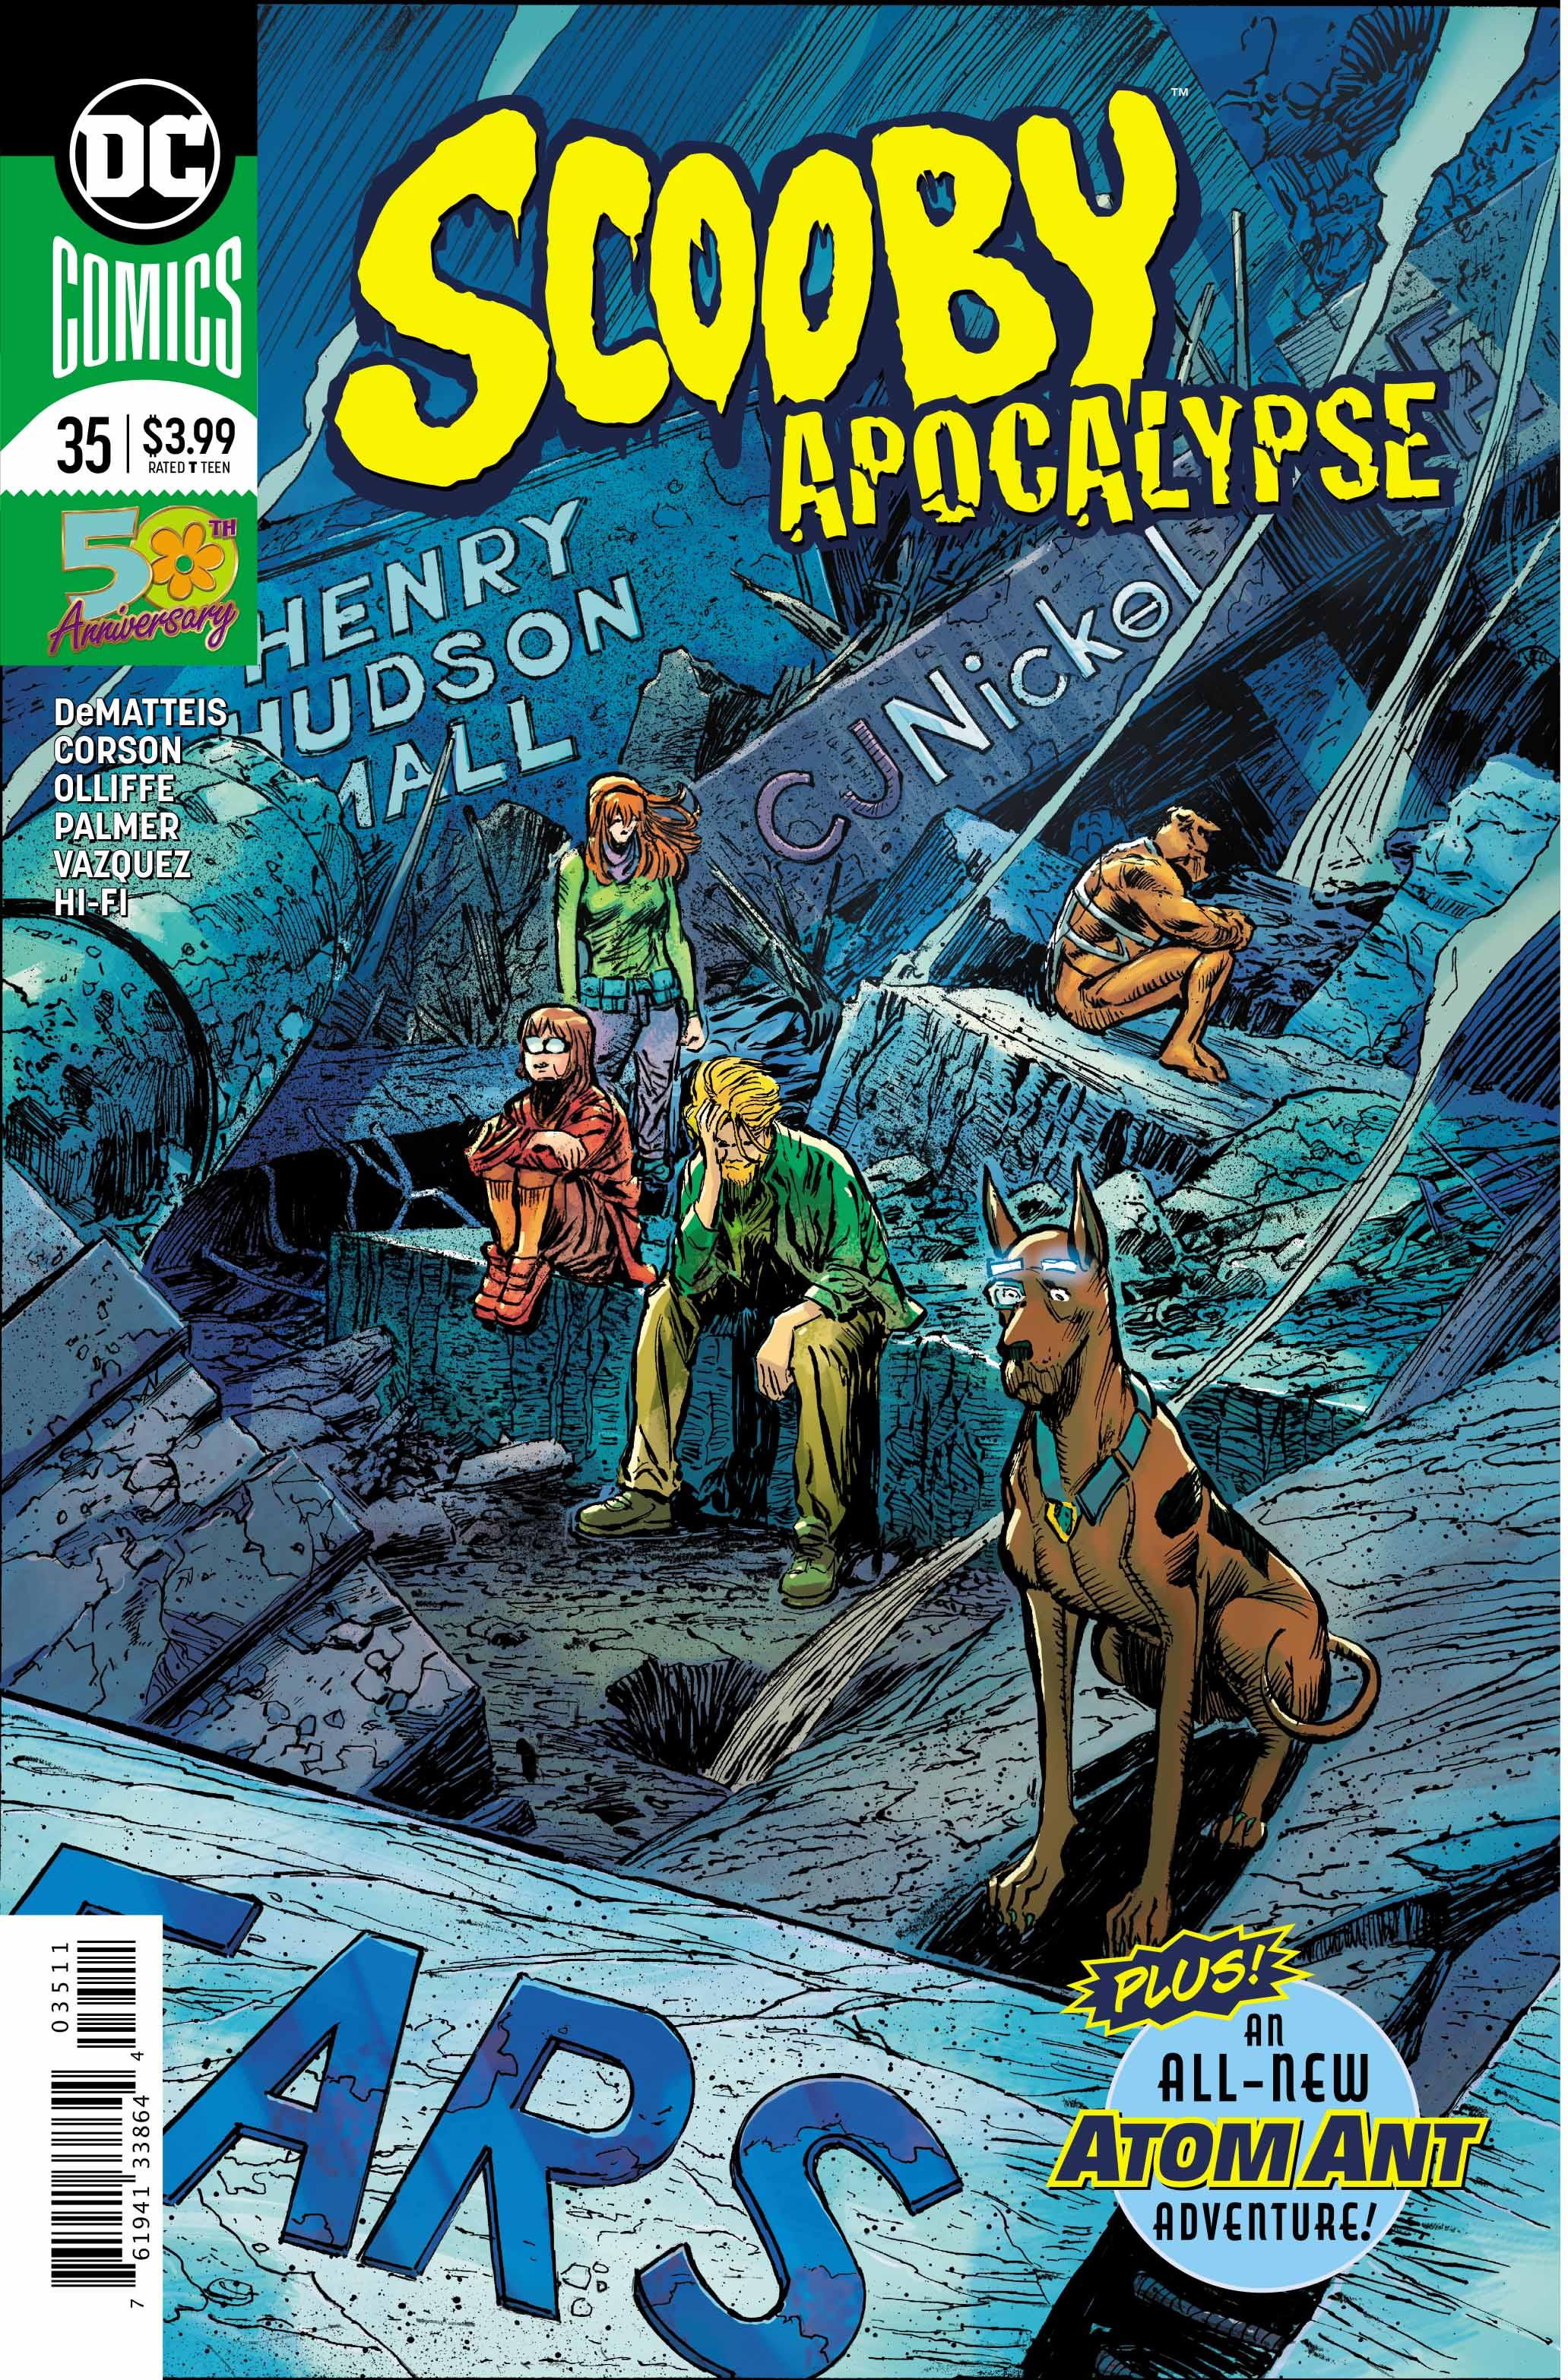 Exclusive Preview: SCOOBY APOCALYPSE #35 - Freaksugar